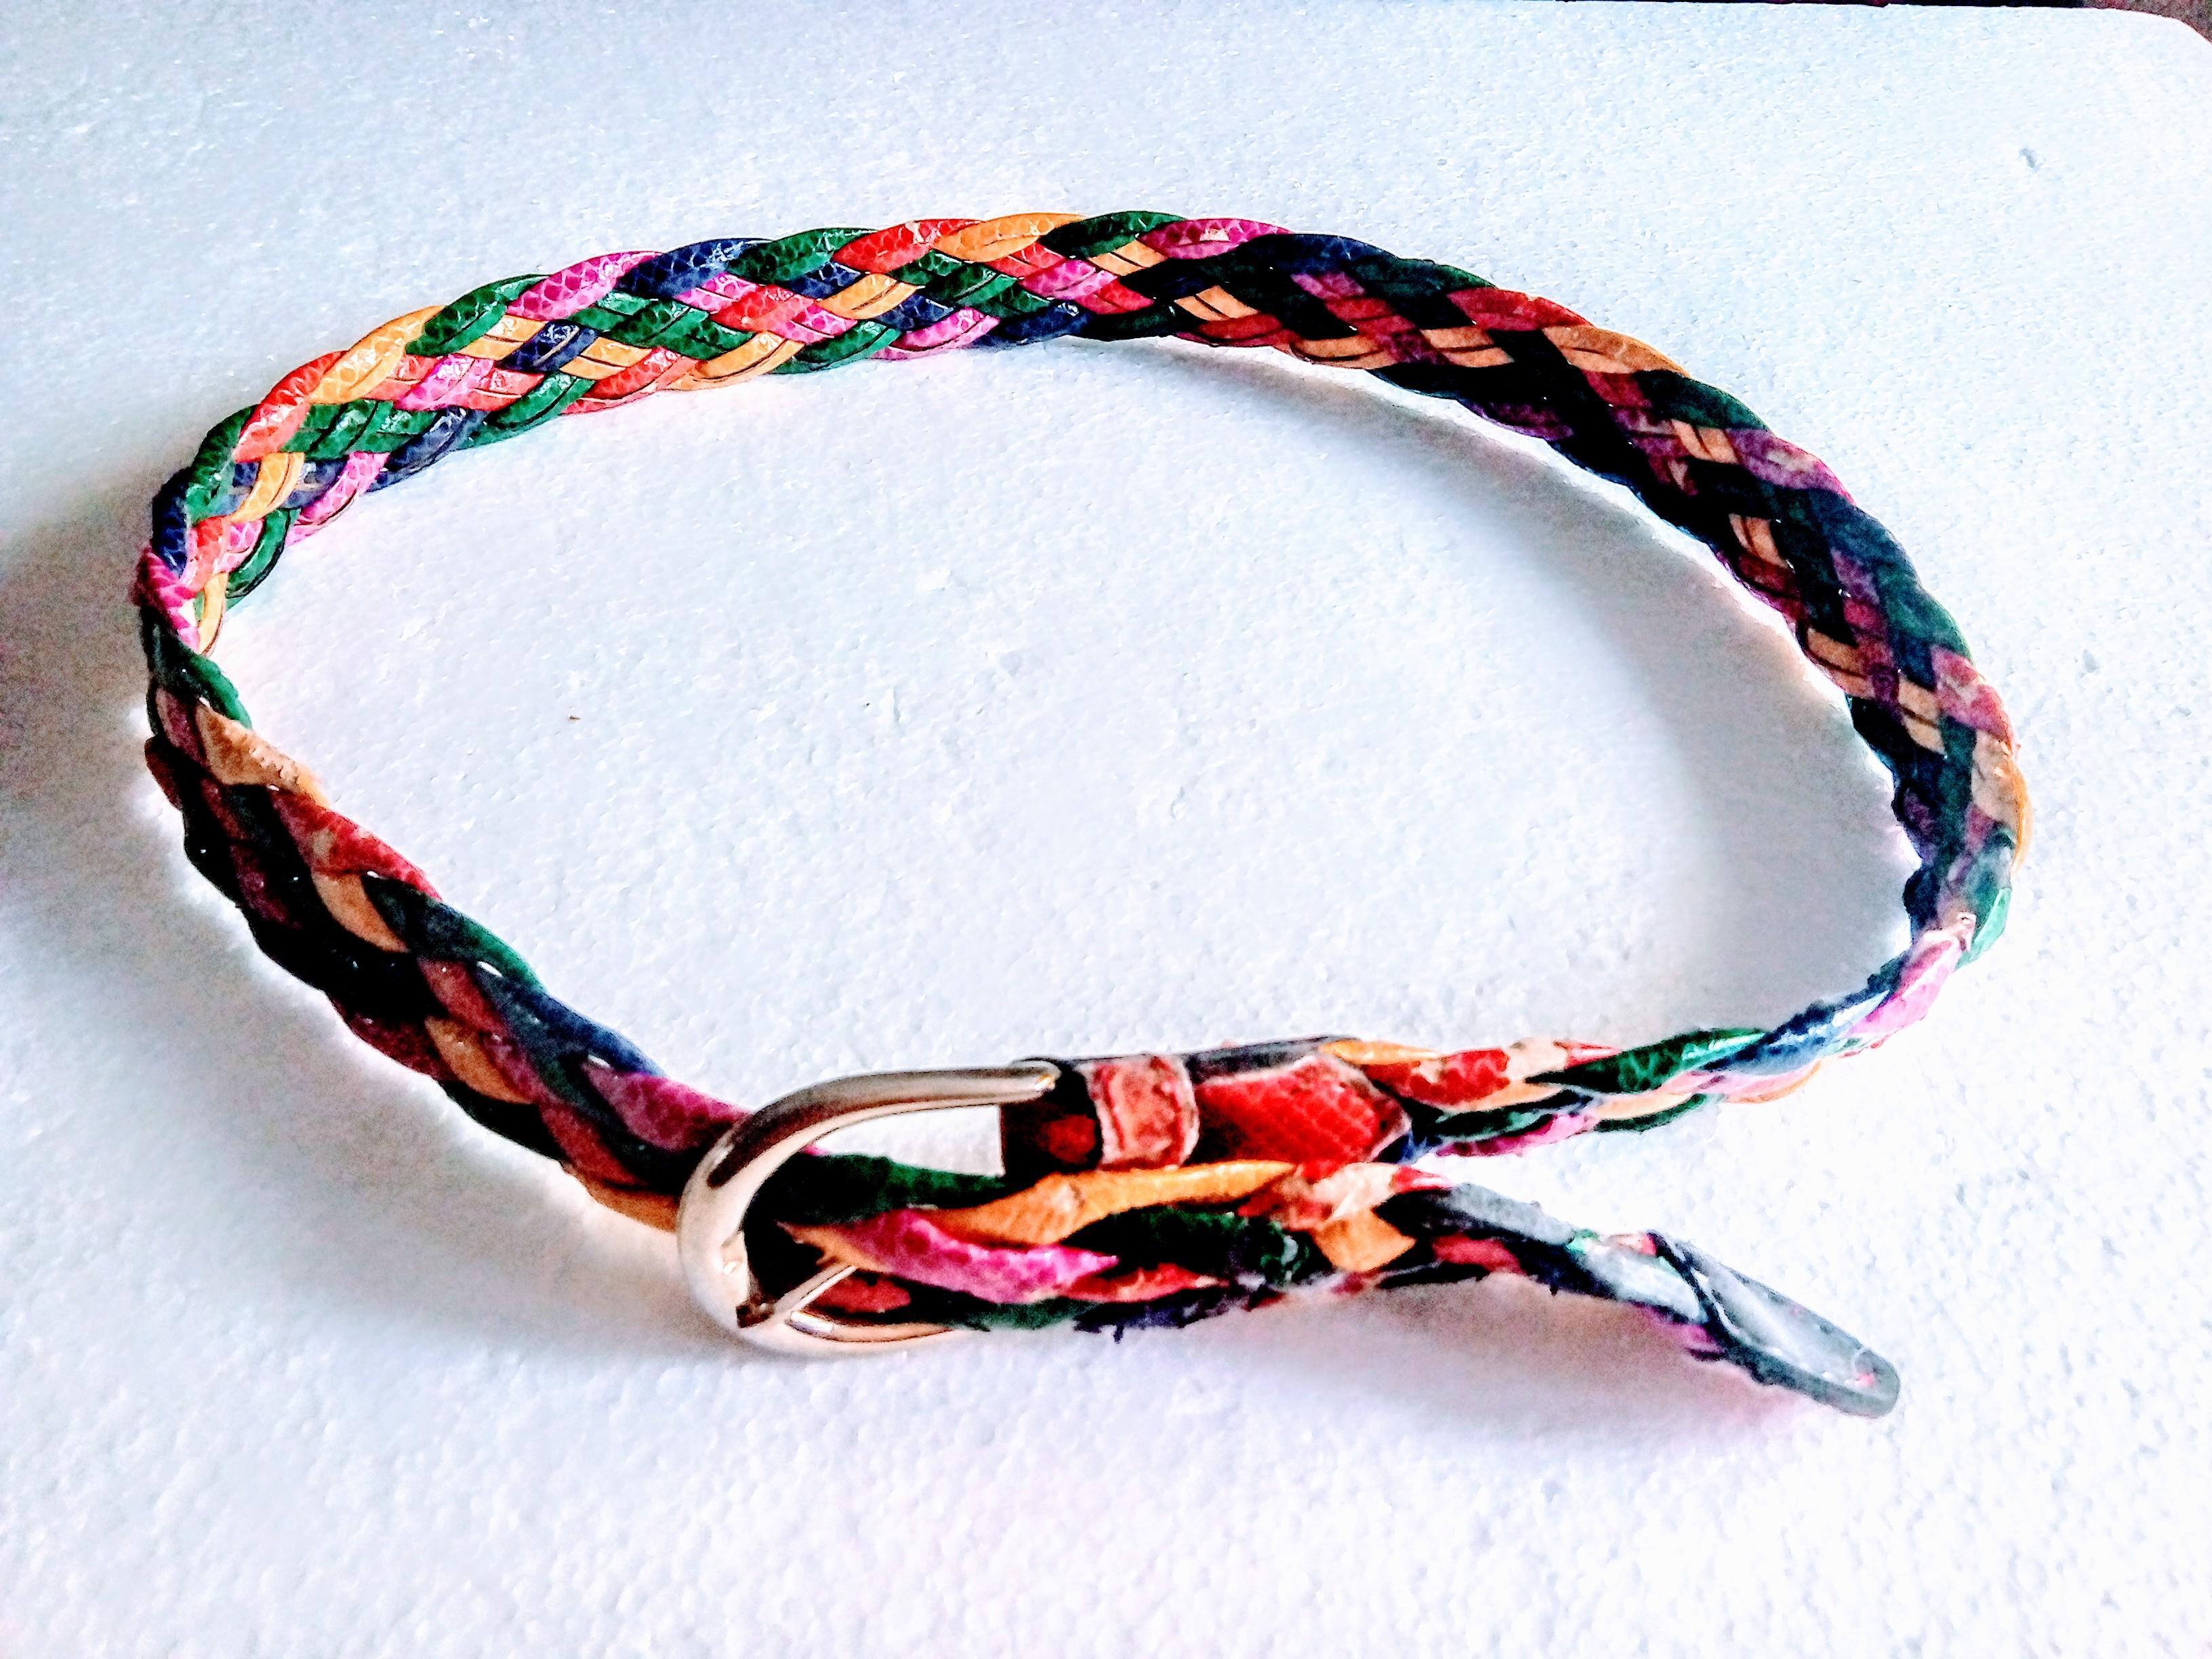 troc de troc ceinture tressÉe multicolore image 0